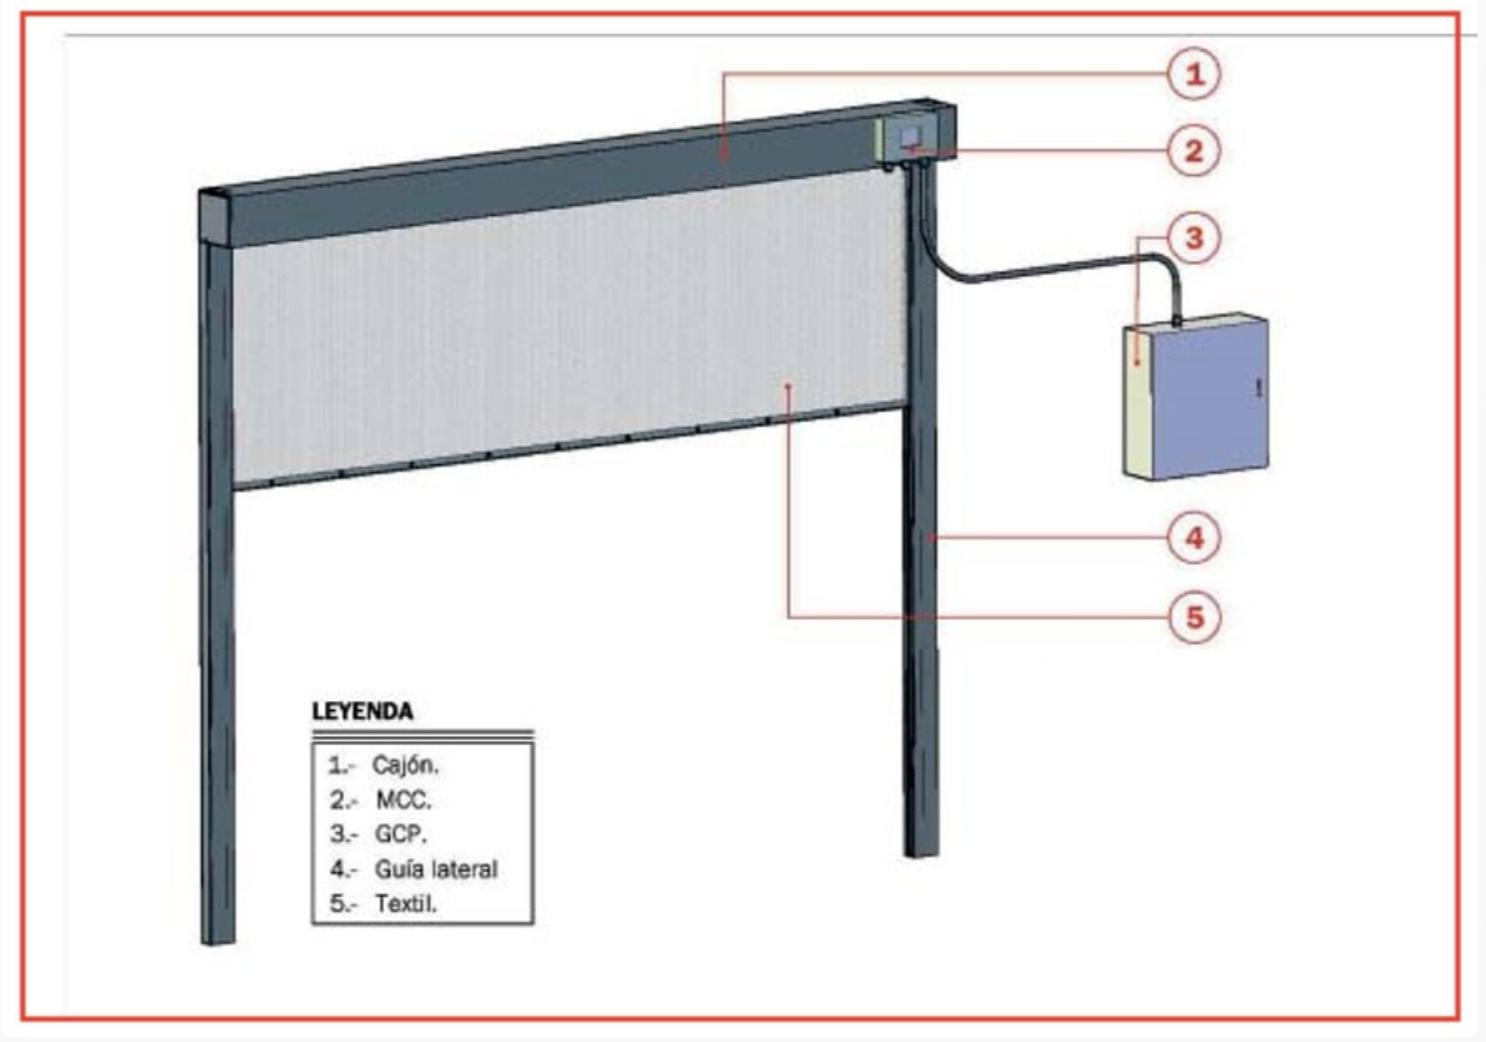 esquema cortina sistema automatico cortafuego synixtor